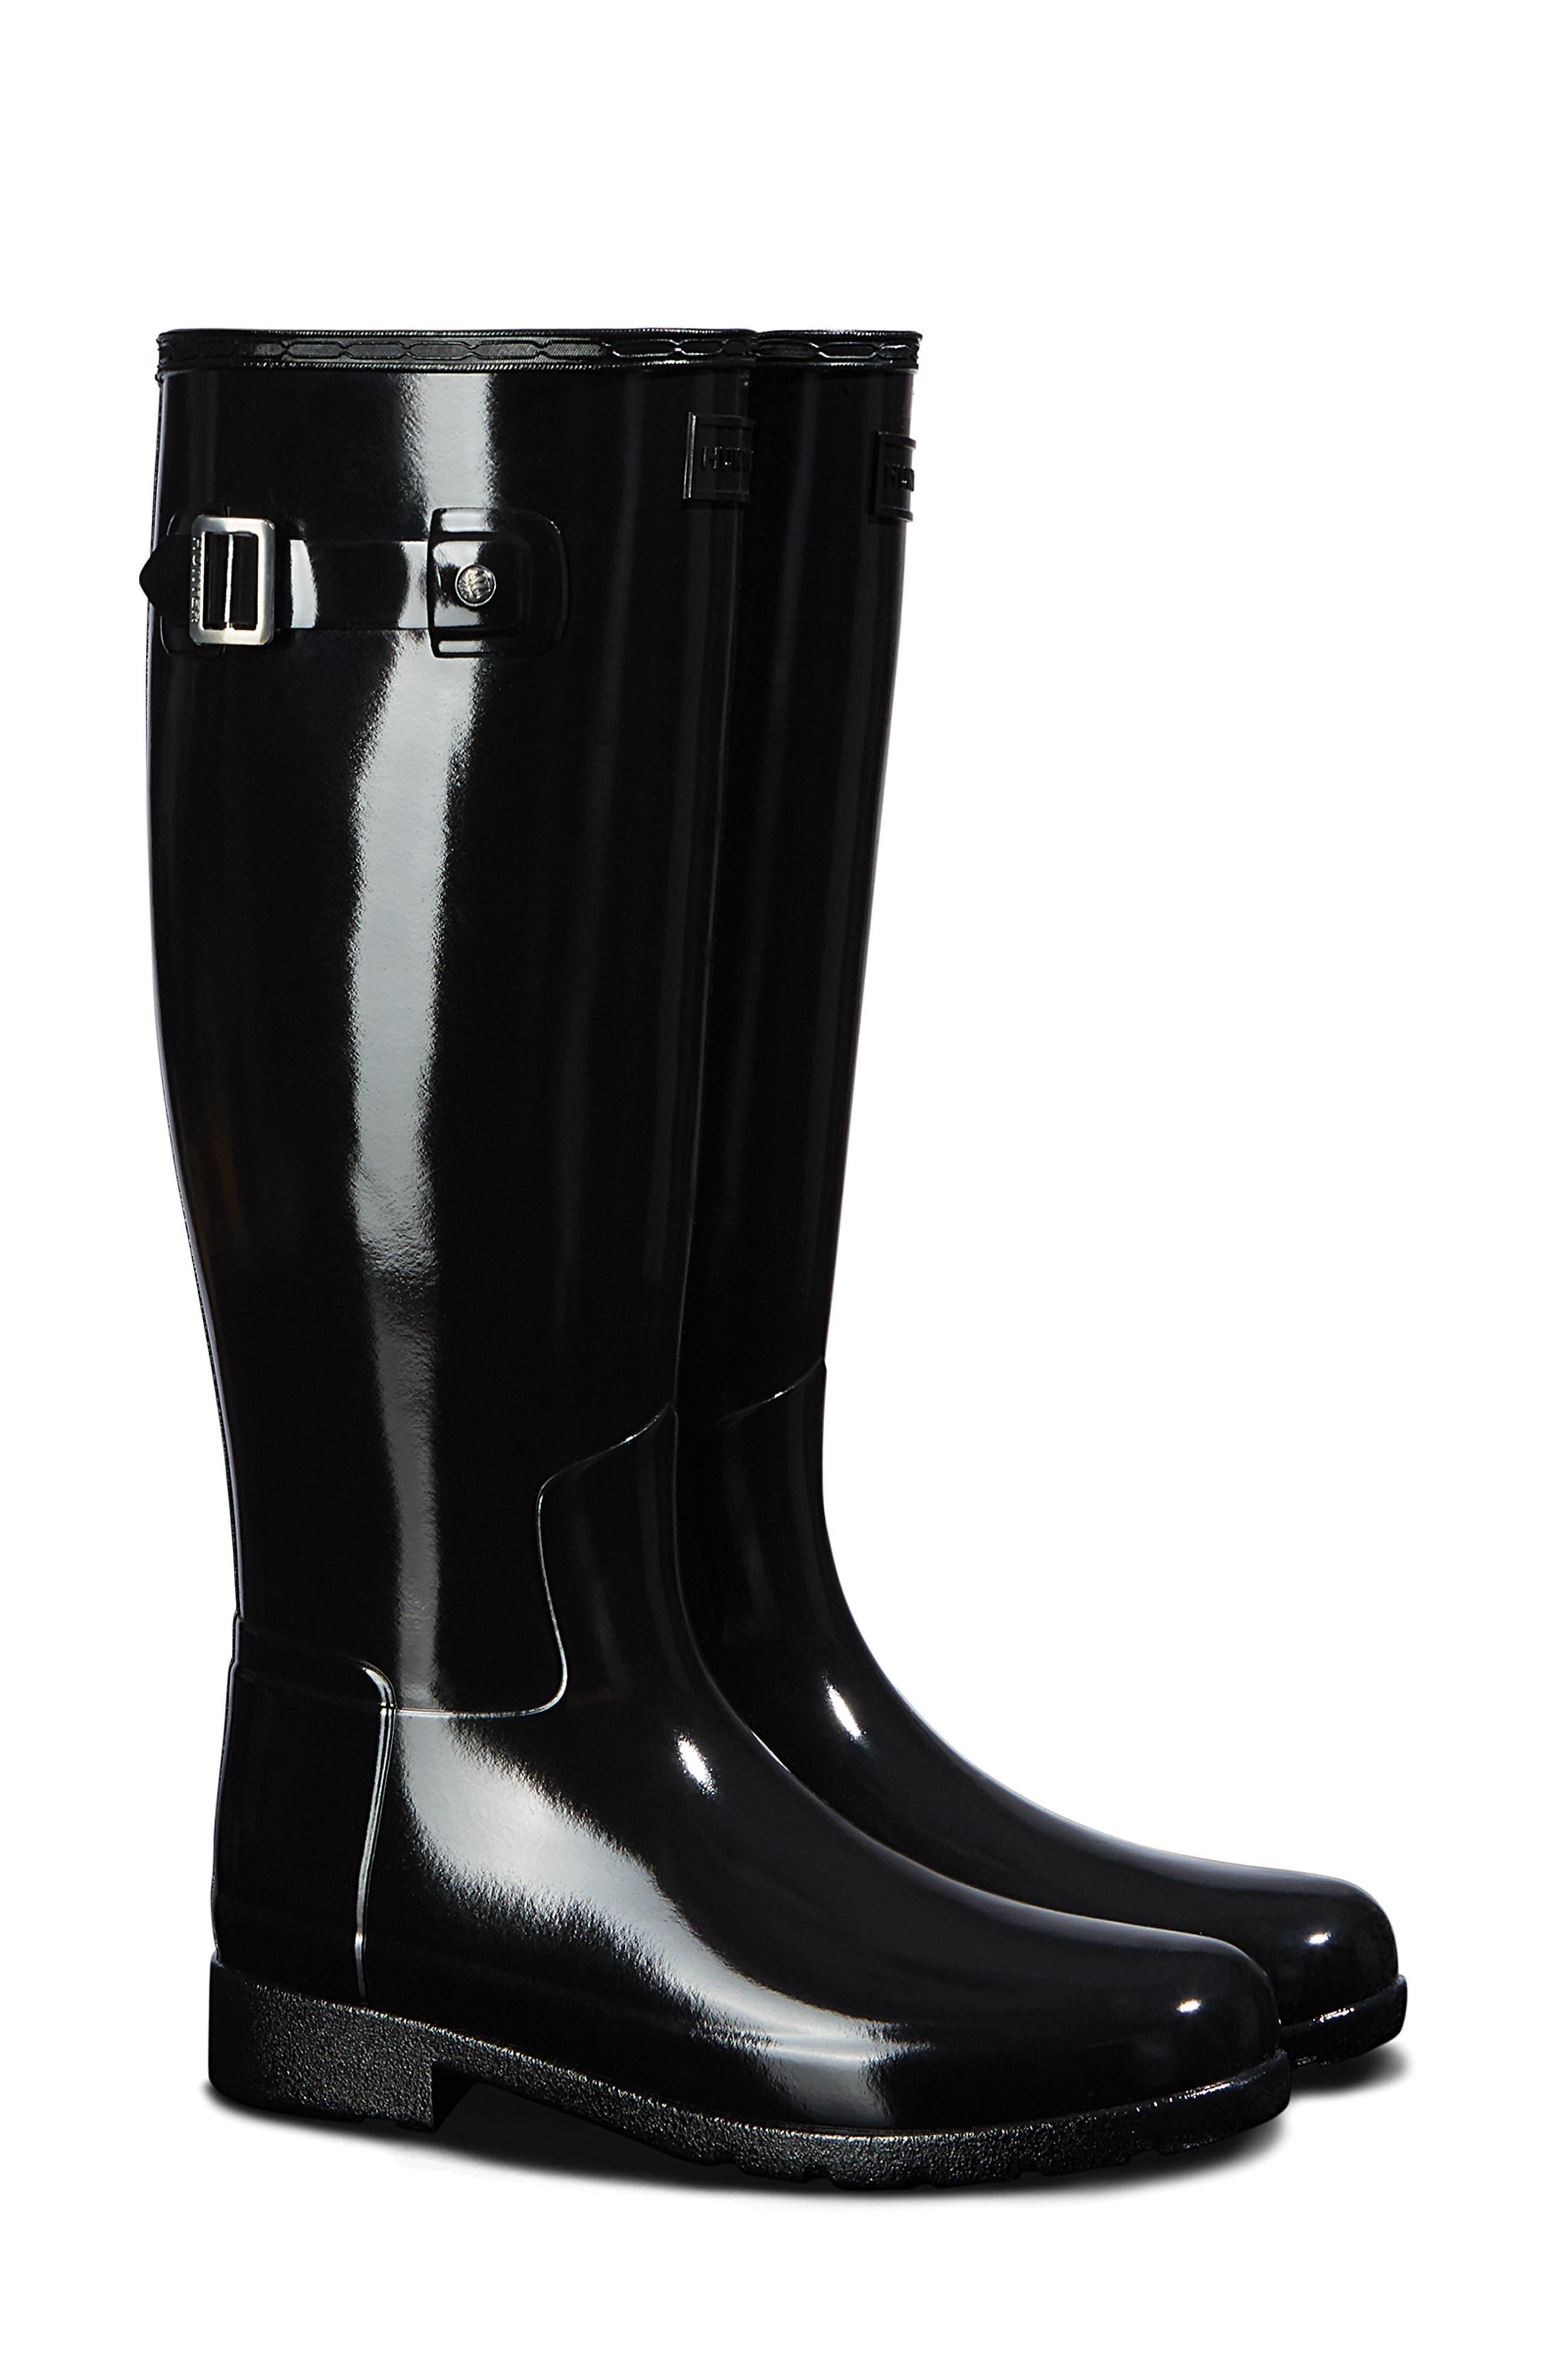 HUNTER, Original Refined Gloss Tall Waterproof Rain Boot, Main thumbnail 1, color, BLACK